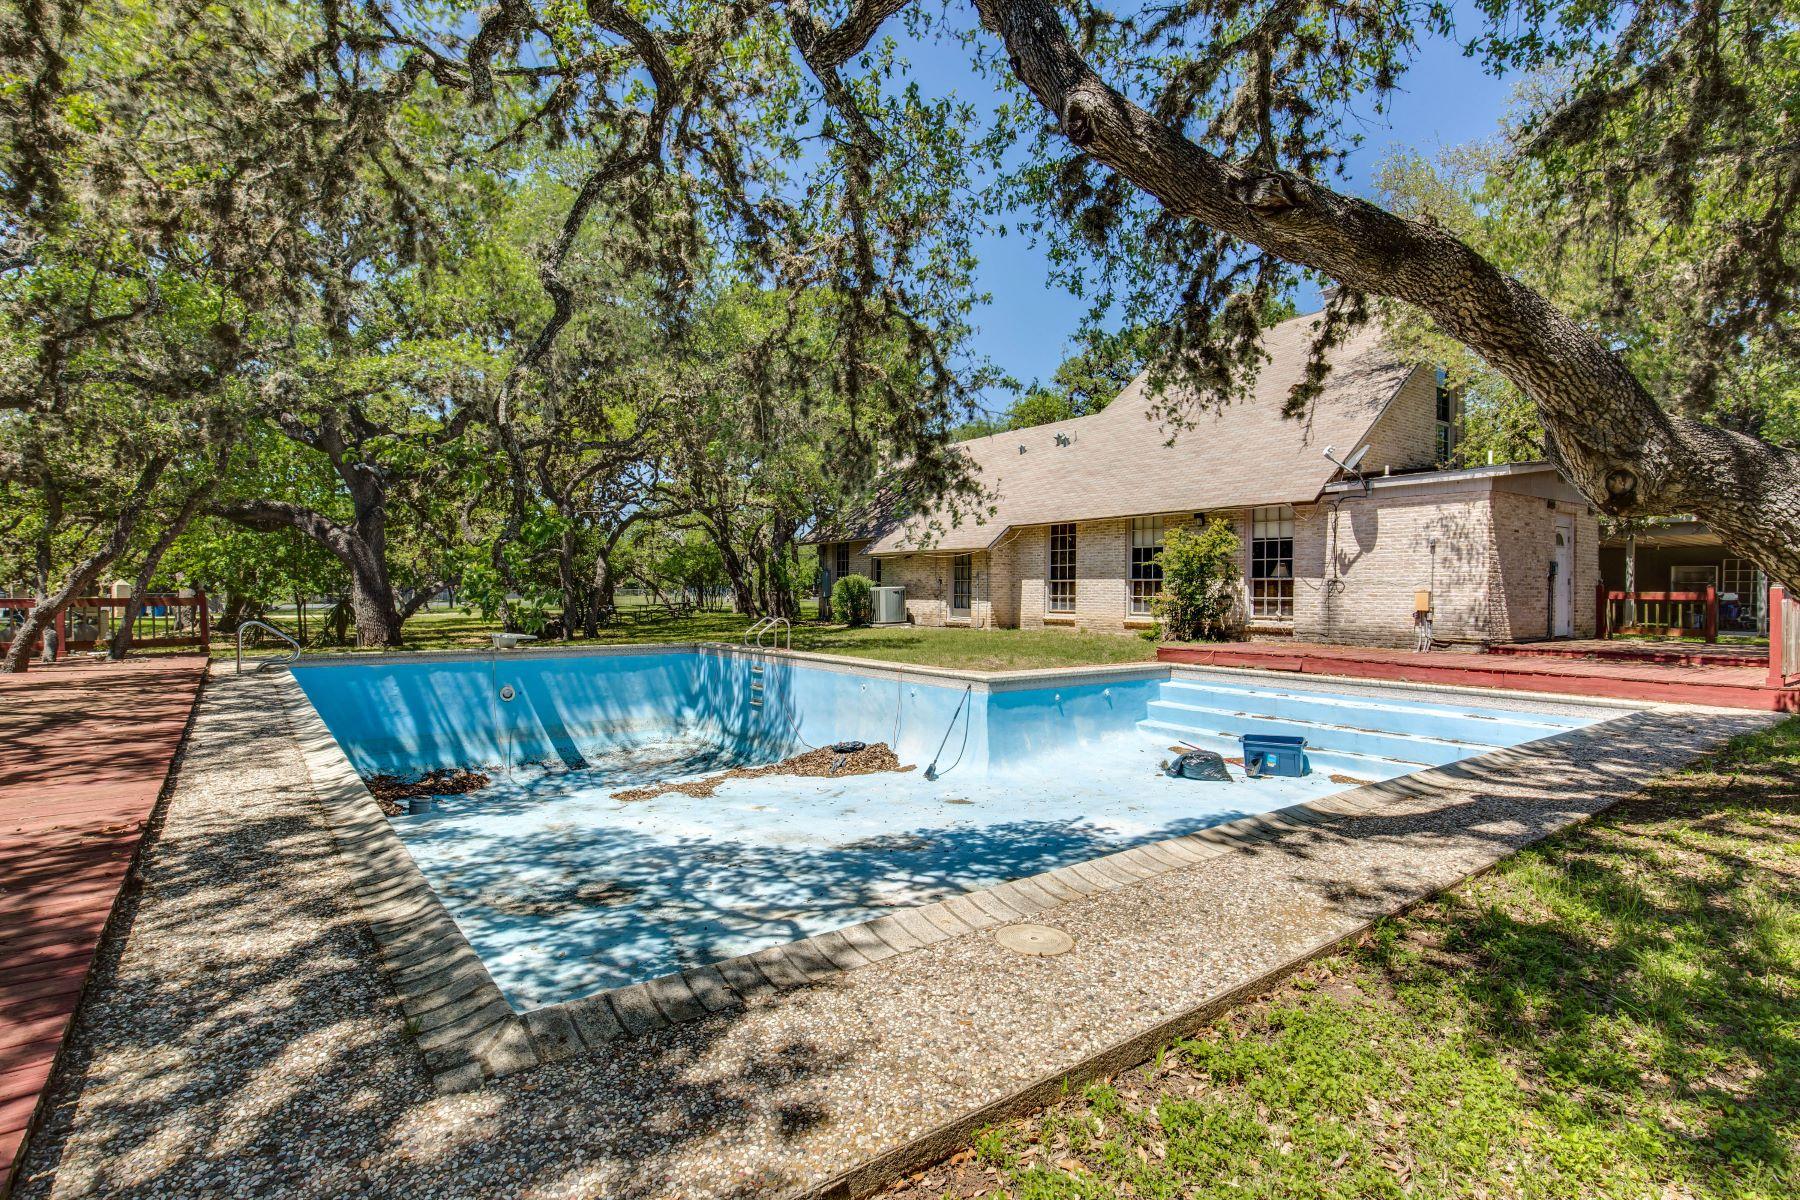 Additional photo for property listing at 15608 Northwest Military Highway, Shavano Park, TX 78231 15608 Northwest Military Highway San Antonio, Texas 78231 United States